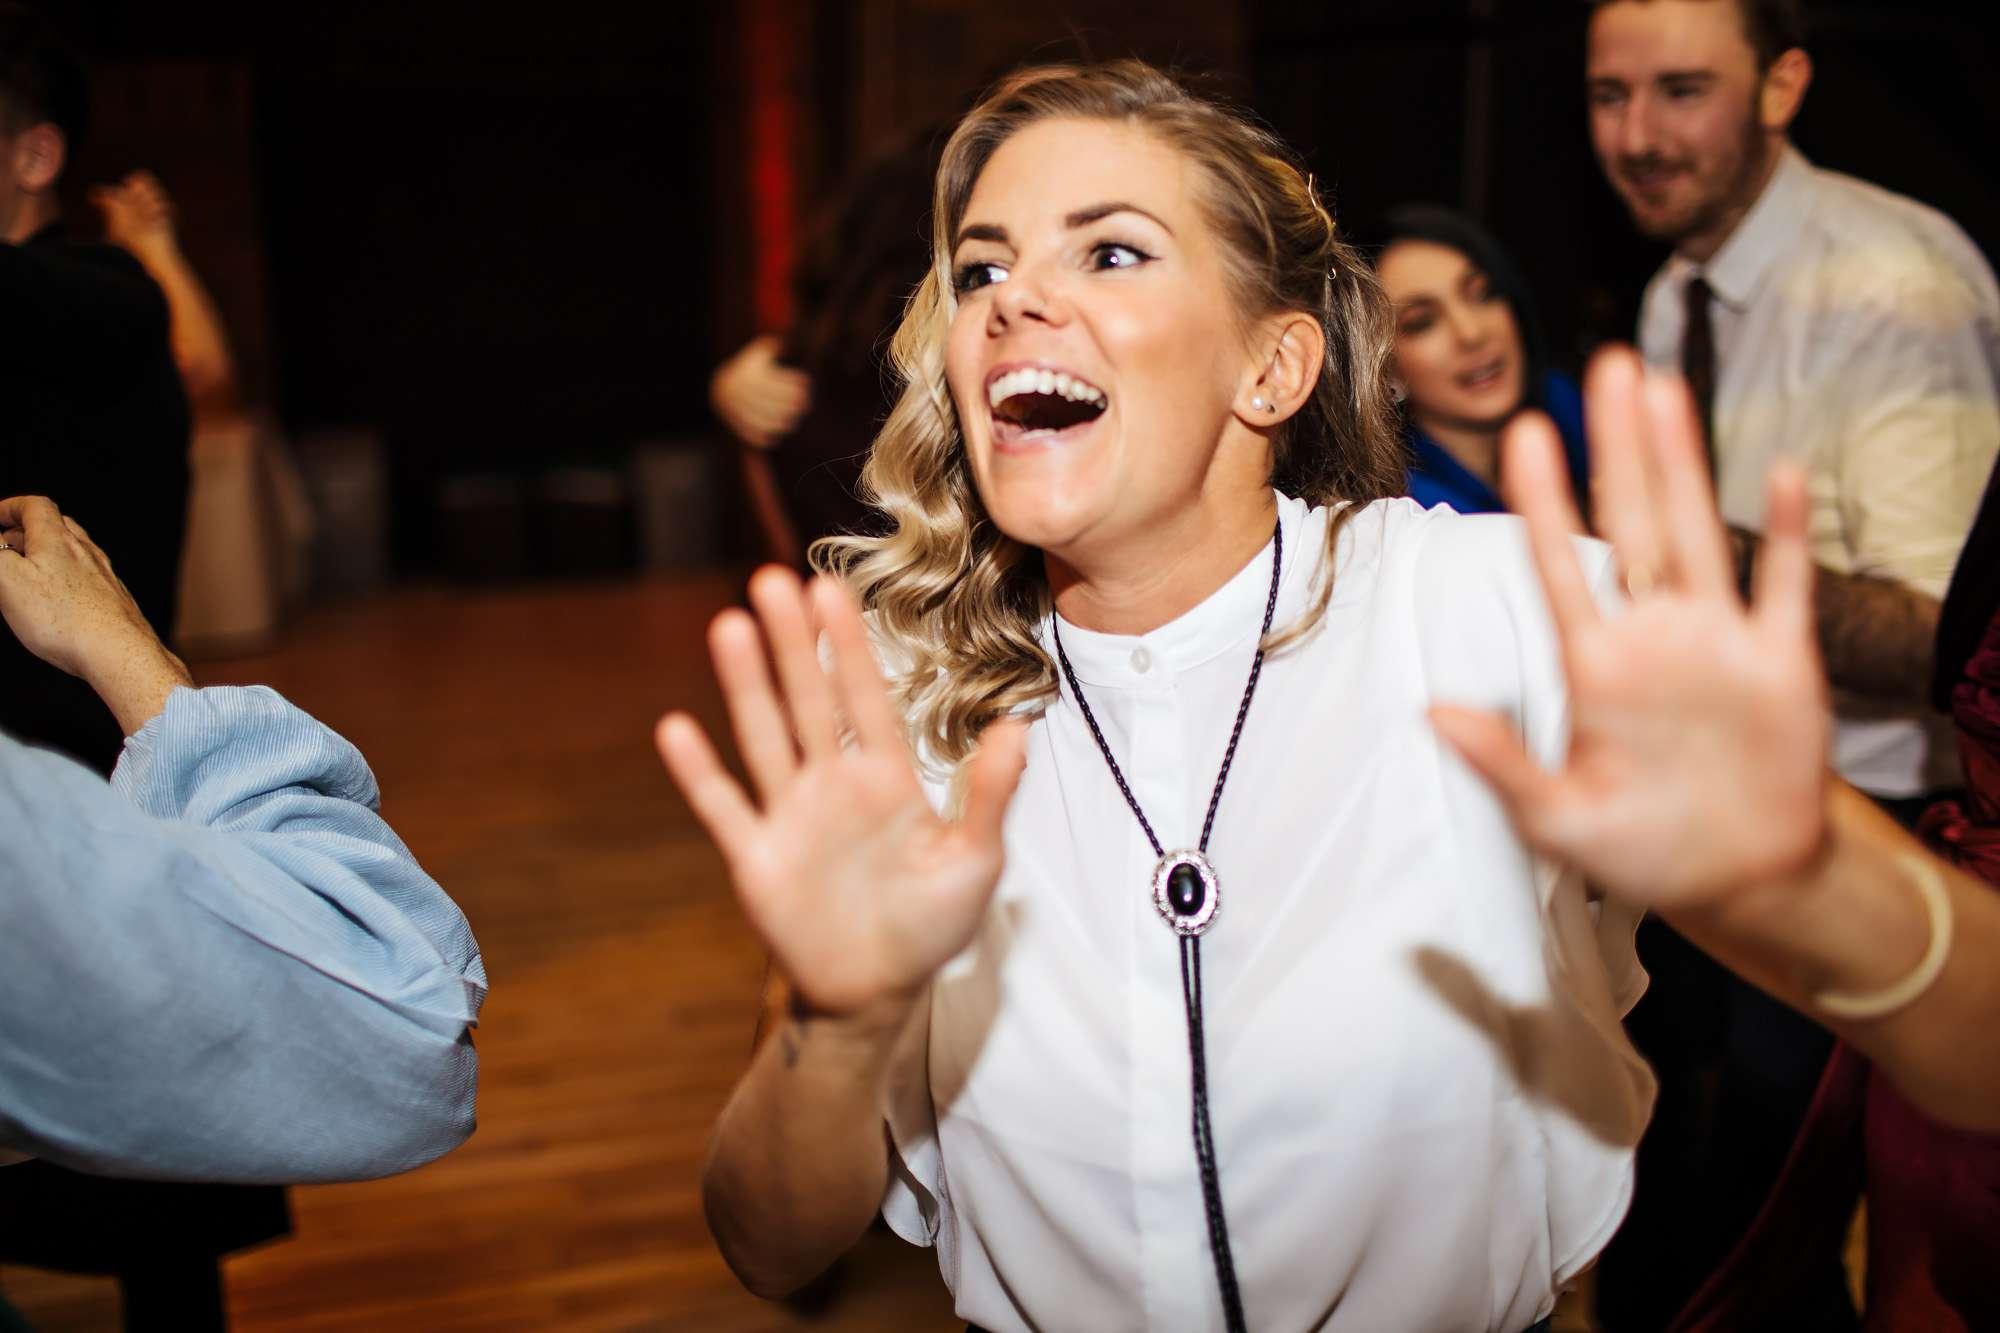 Wedding guests dancing in Blackpool